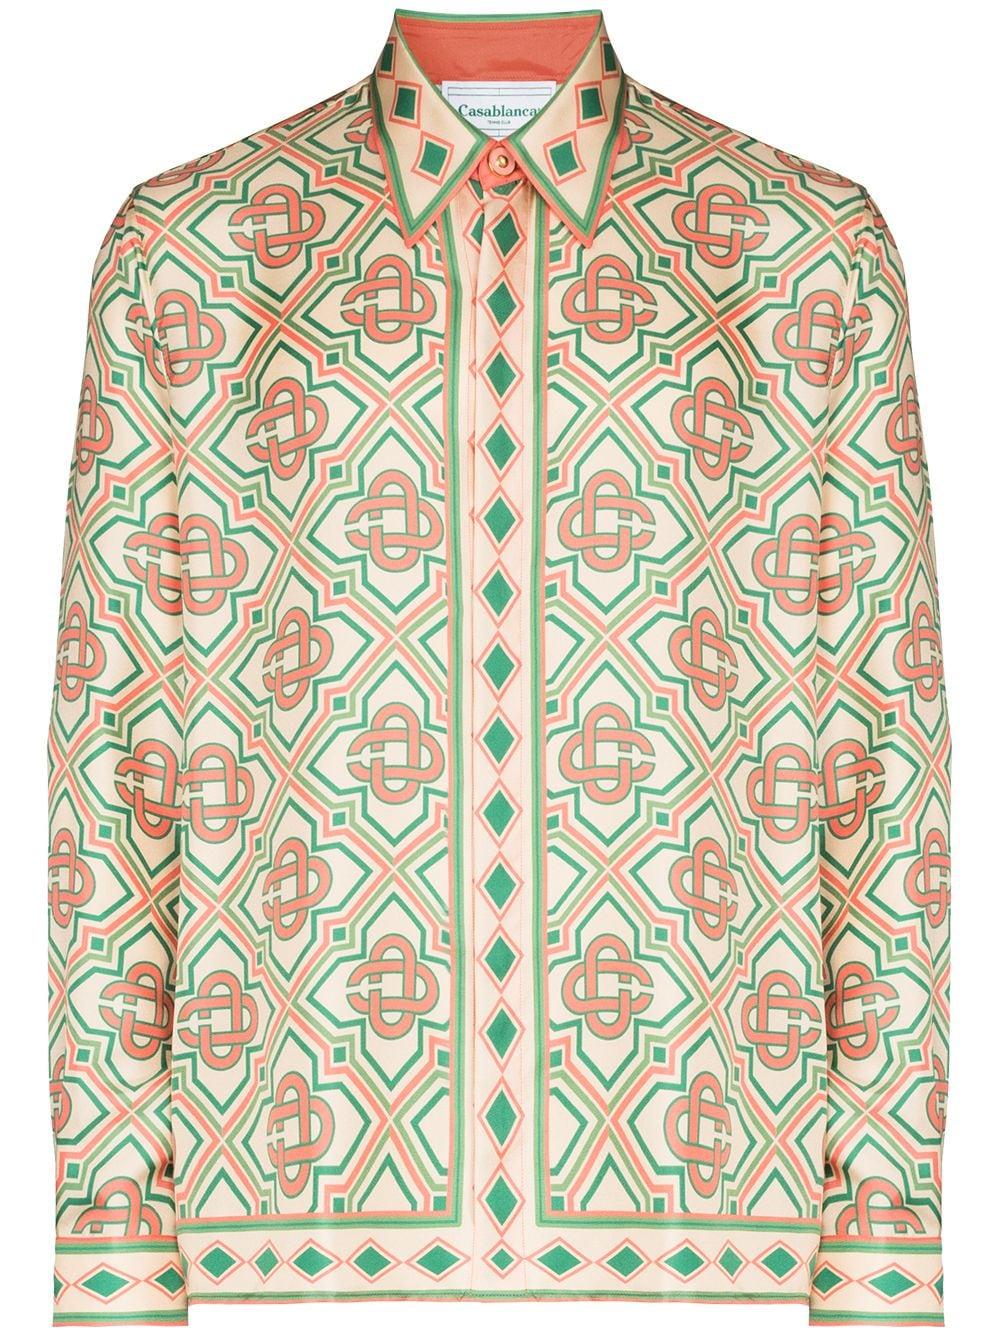 camicia diamond monogram uomo multicolor in seta CASABLANCA   Camicie   MF21-SH-021DIAMOND MONOGRAM